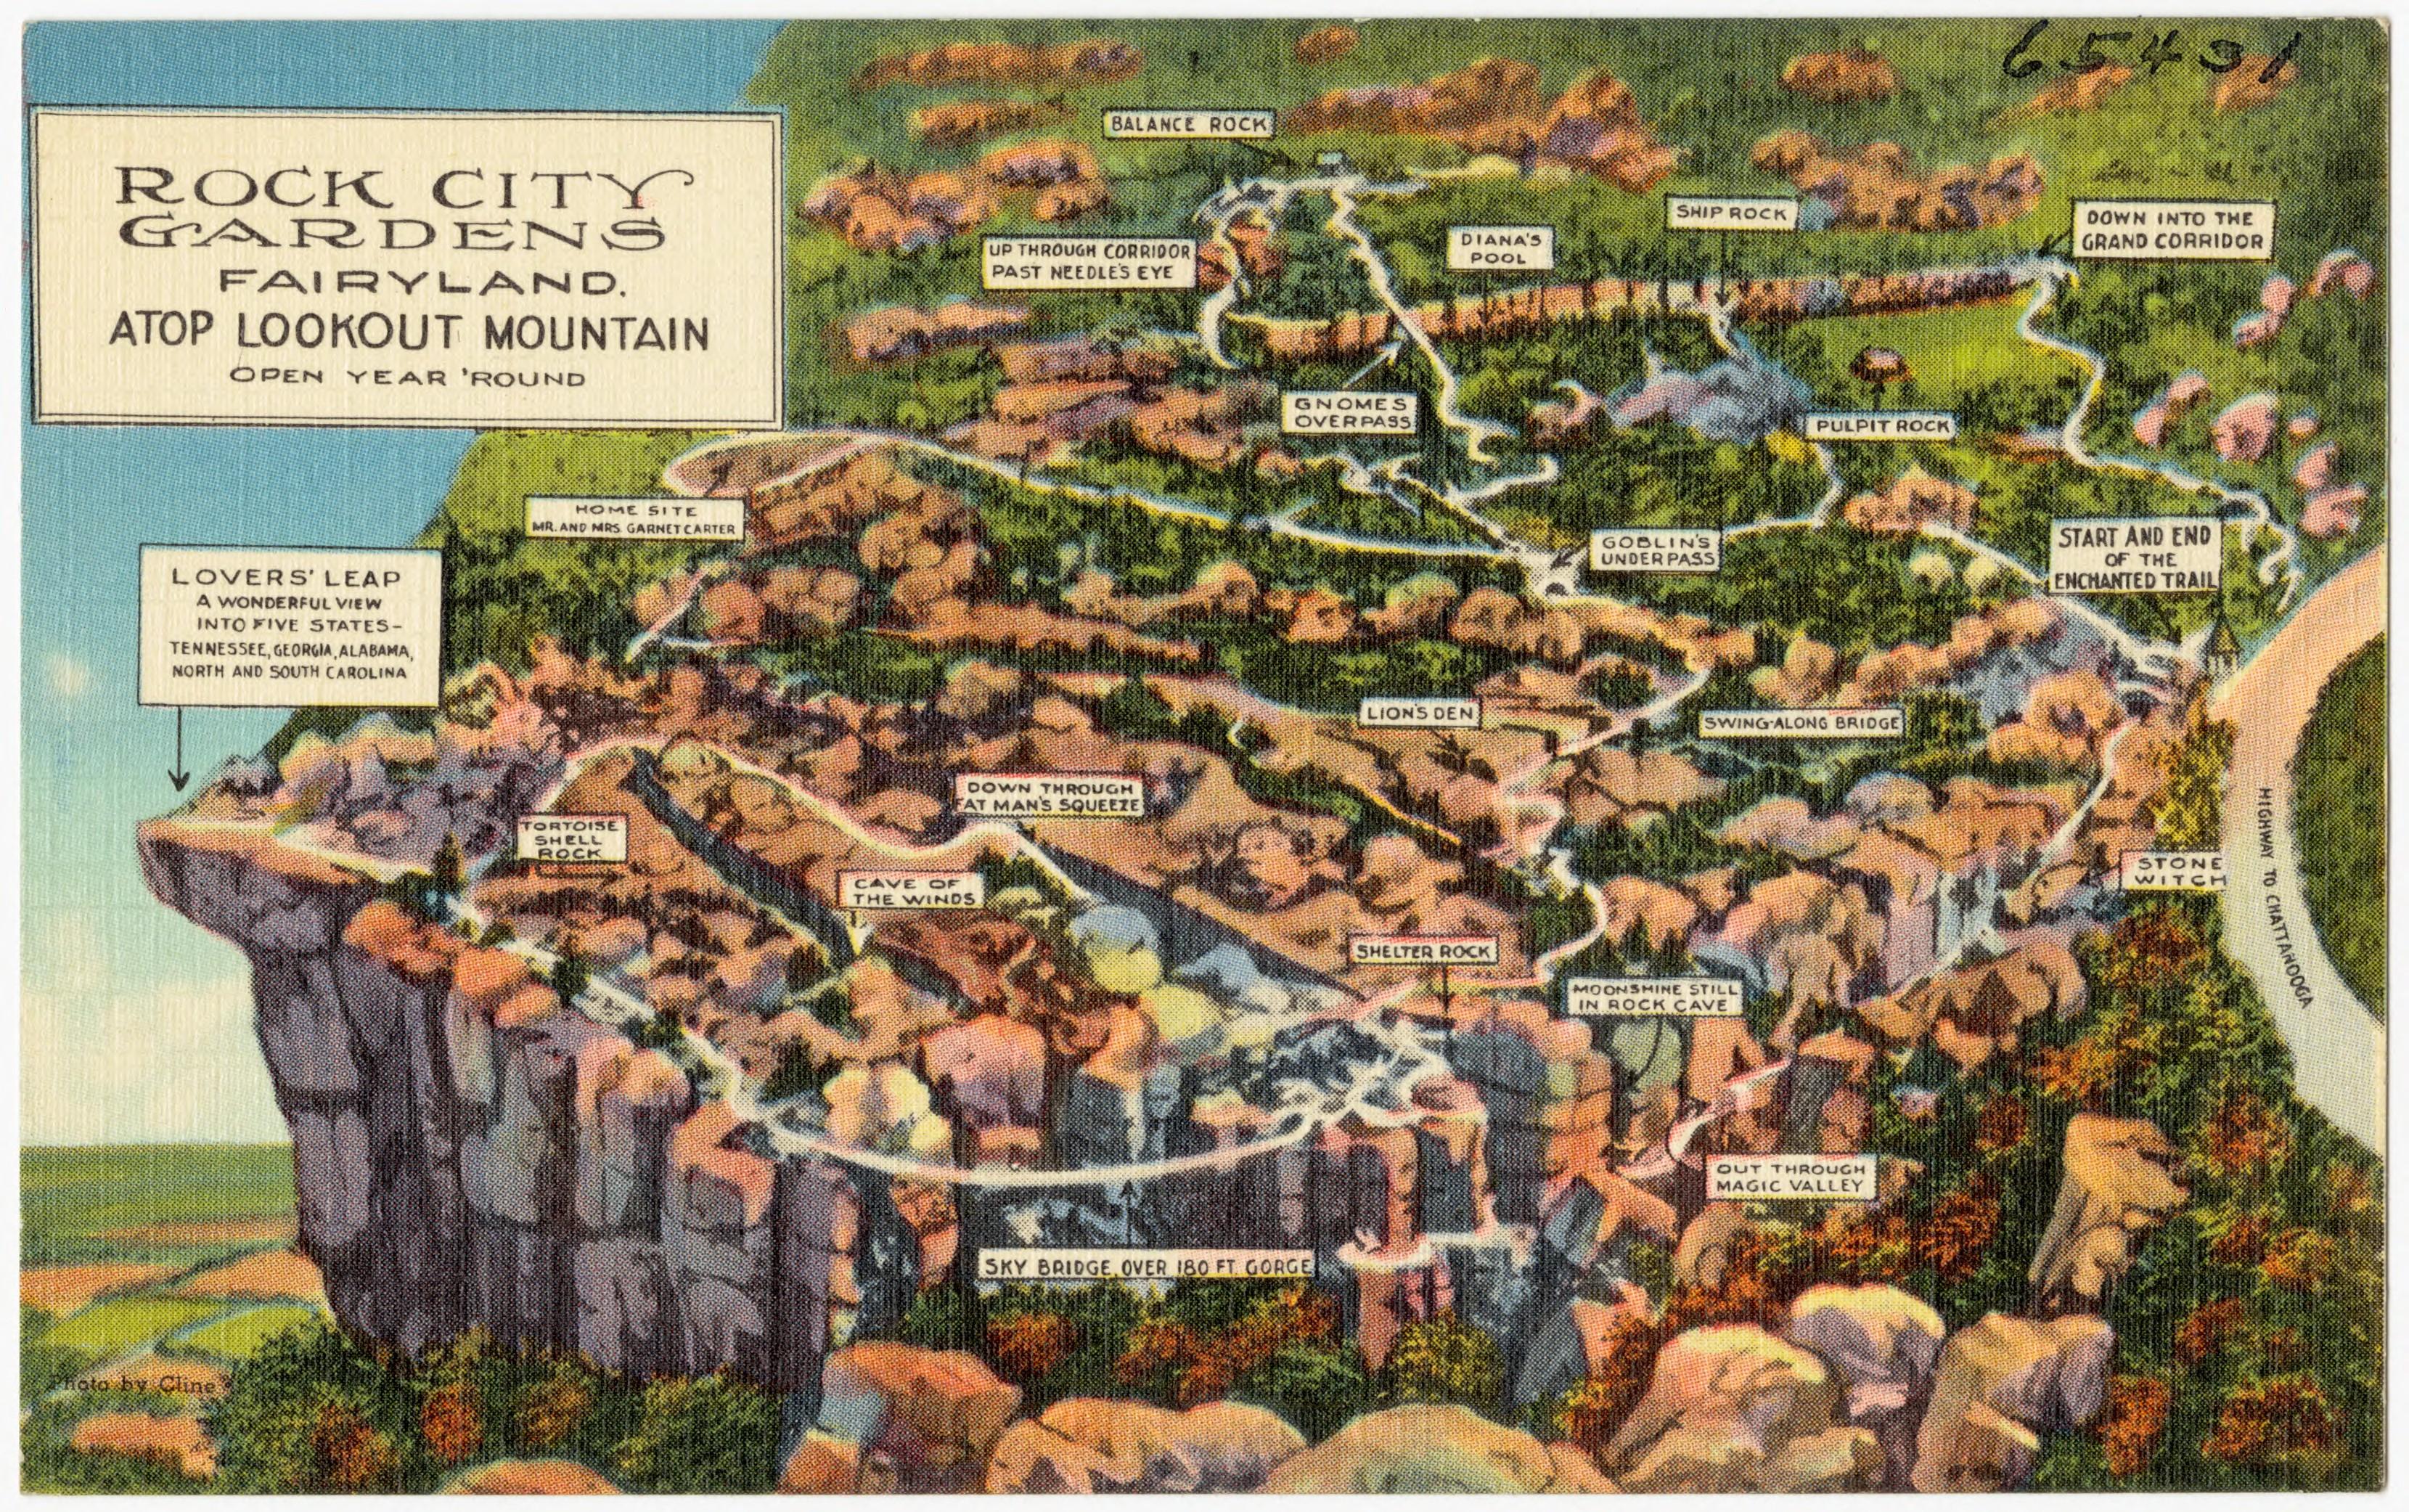 File:Rock City Gardens, Fairyland, Atop Lookout Mountain, Open Year U0027round